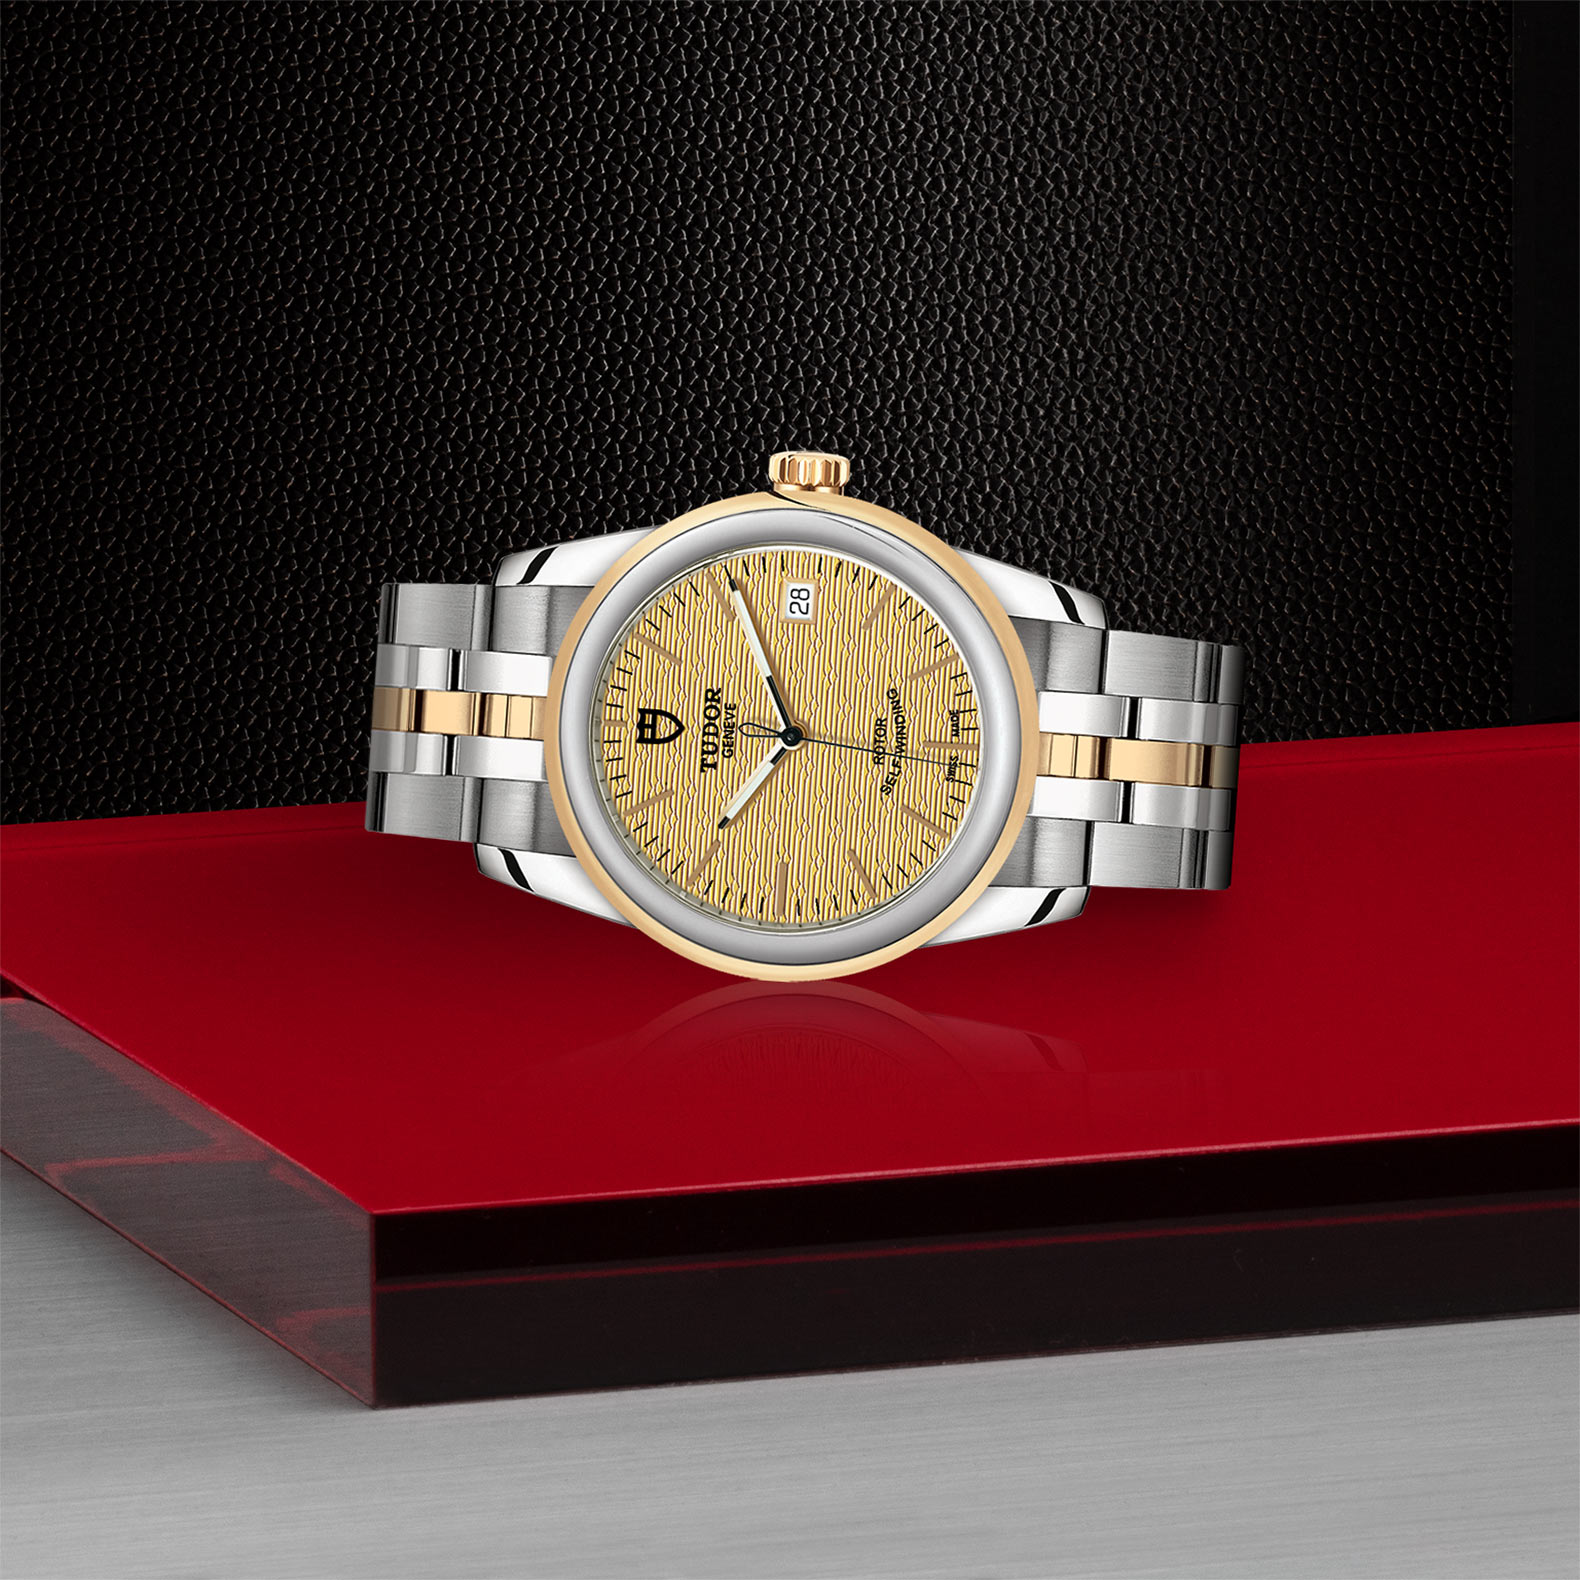 TUDOR Glamour Date - M55003-0003